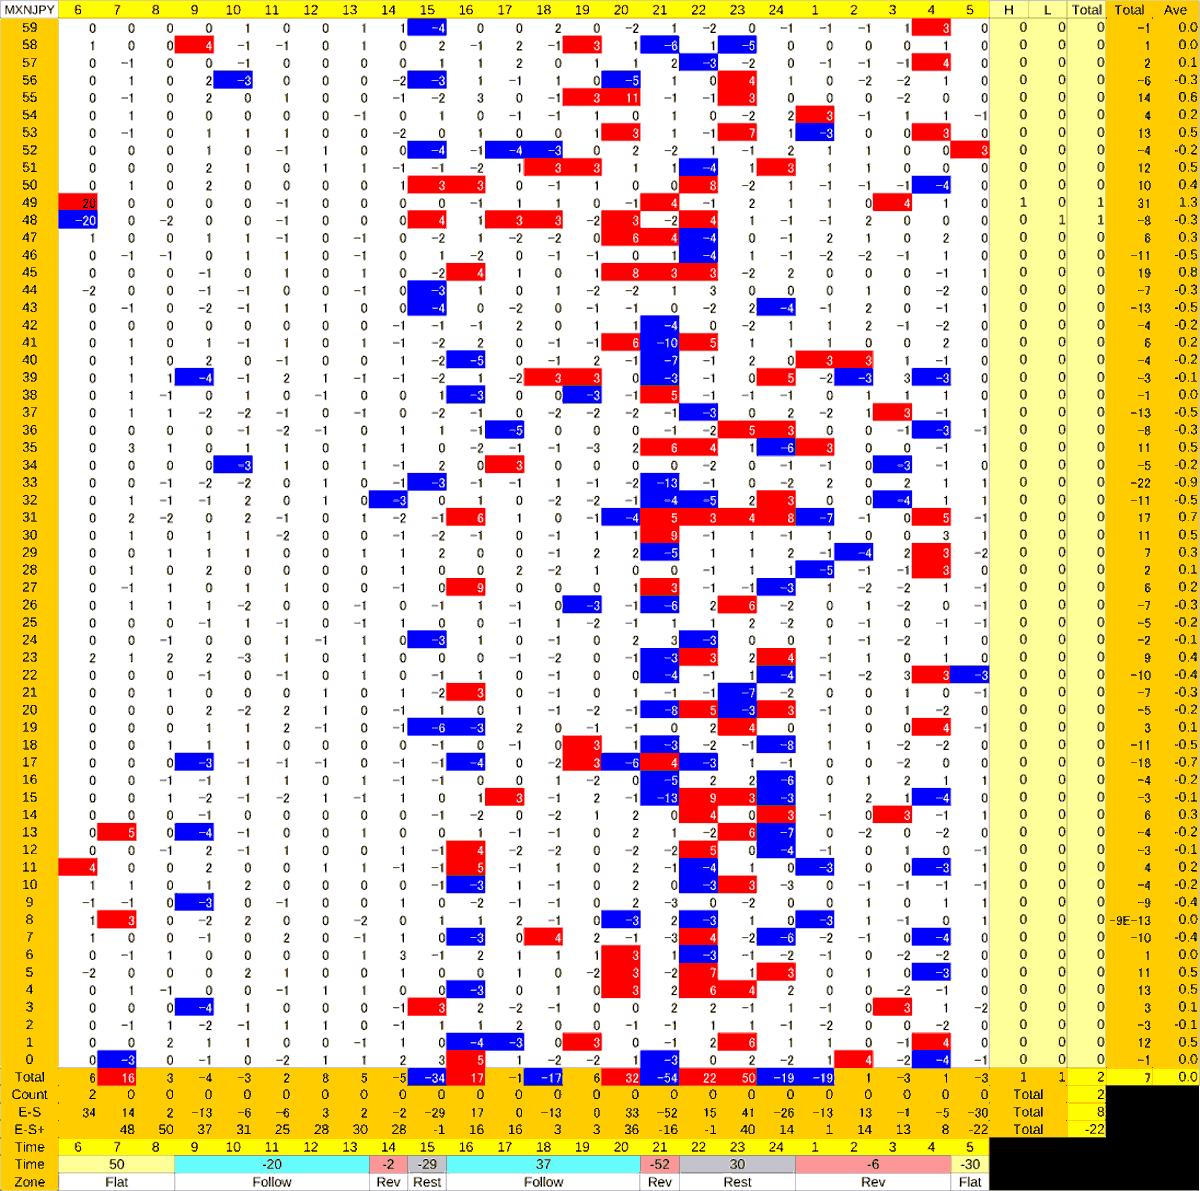 20200604_HS(3)MXNJPY